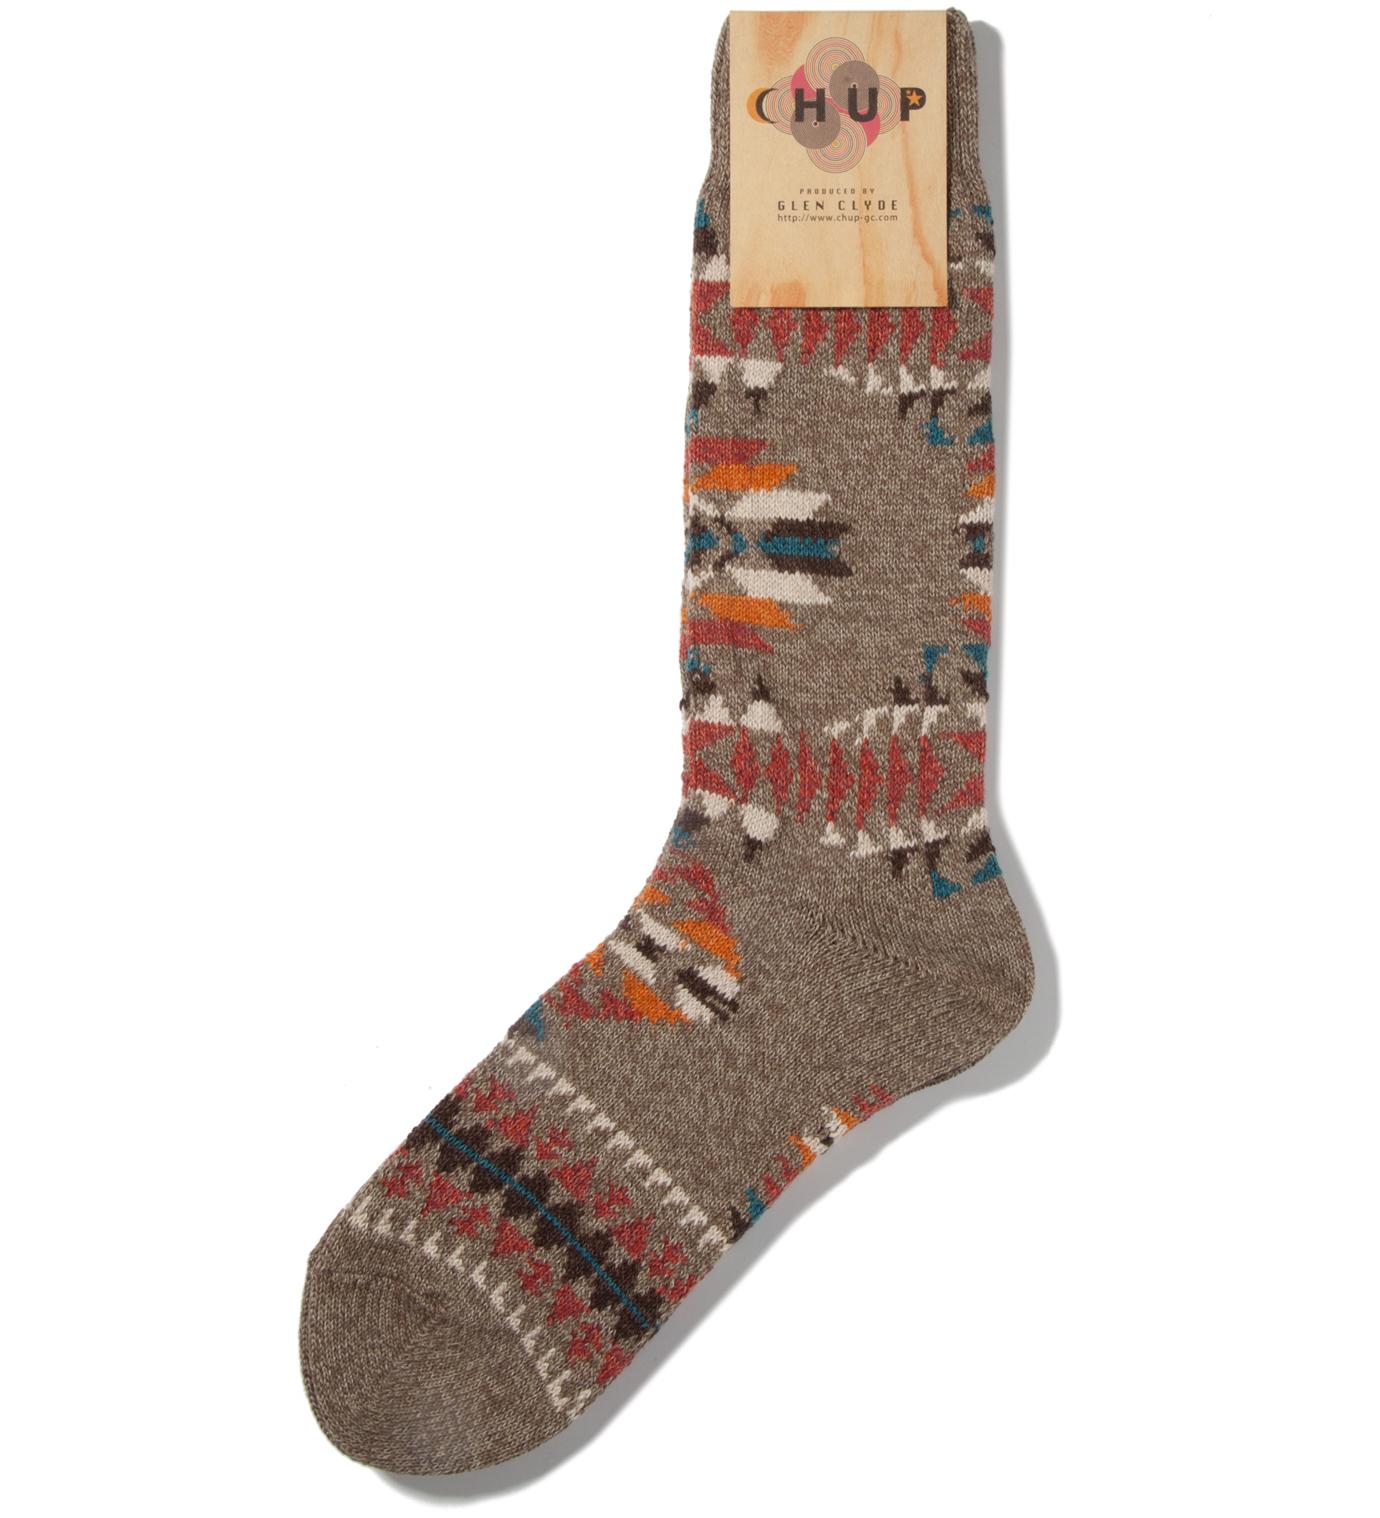 CHUP Moss Serape Socks